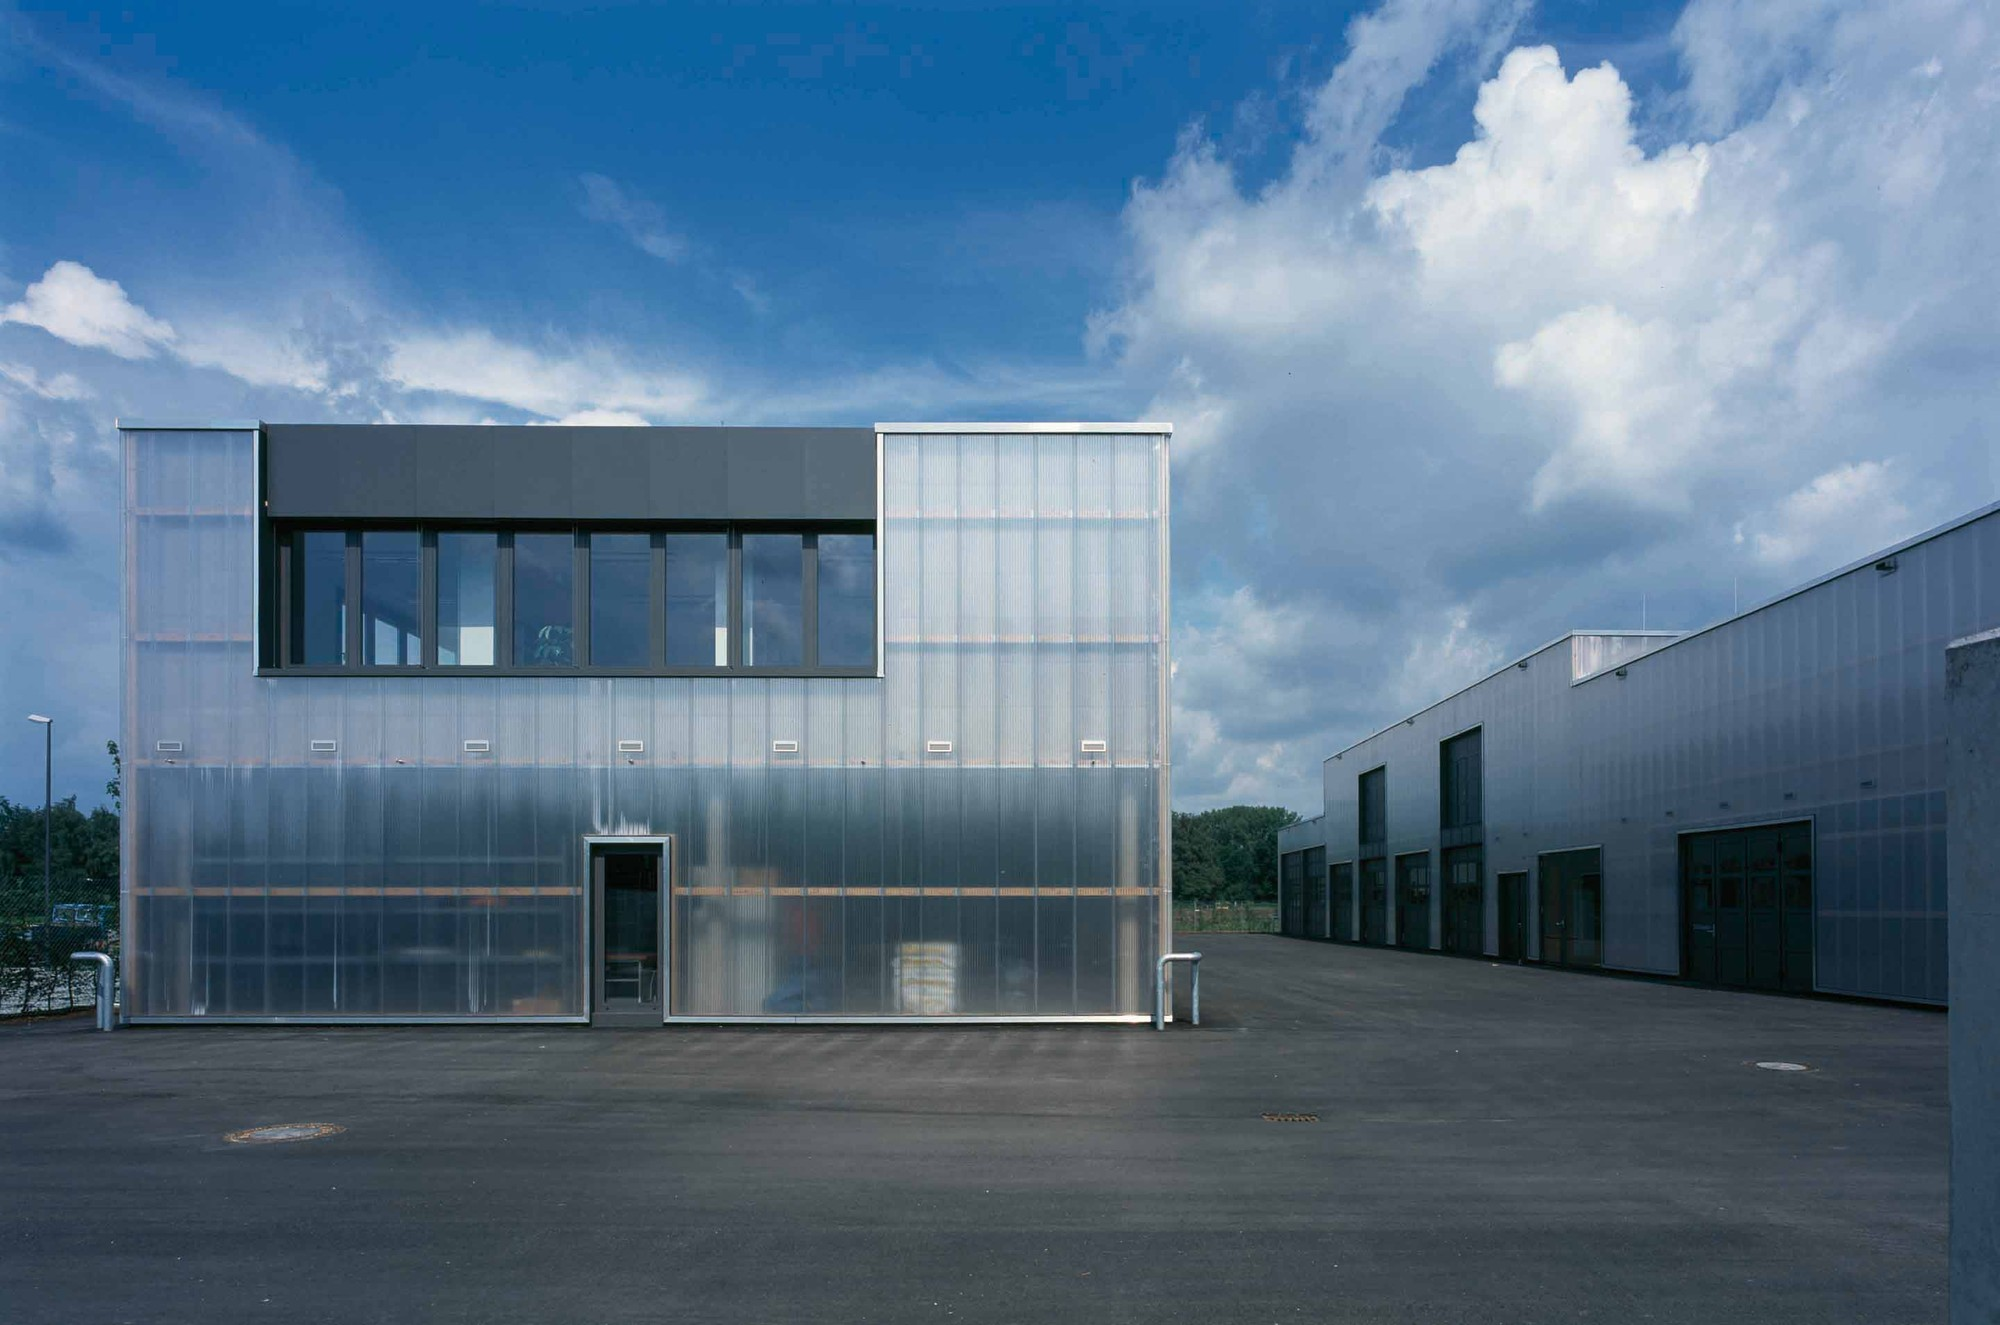 Maintenance Facility / Allmann Sattler Wappner Architekten, © Florian Holzherr